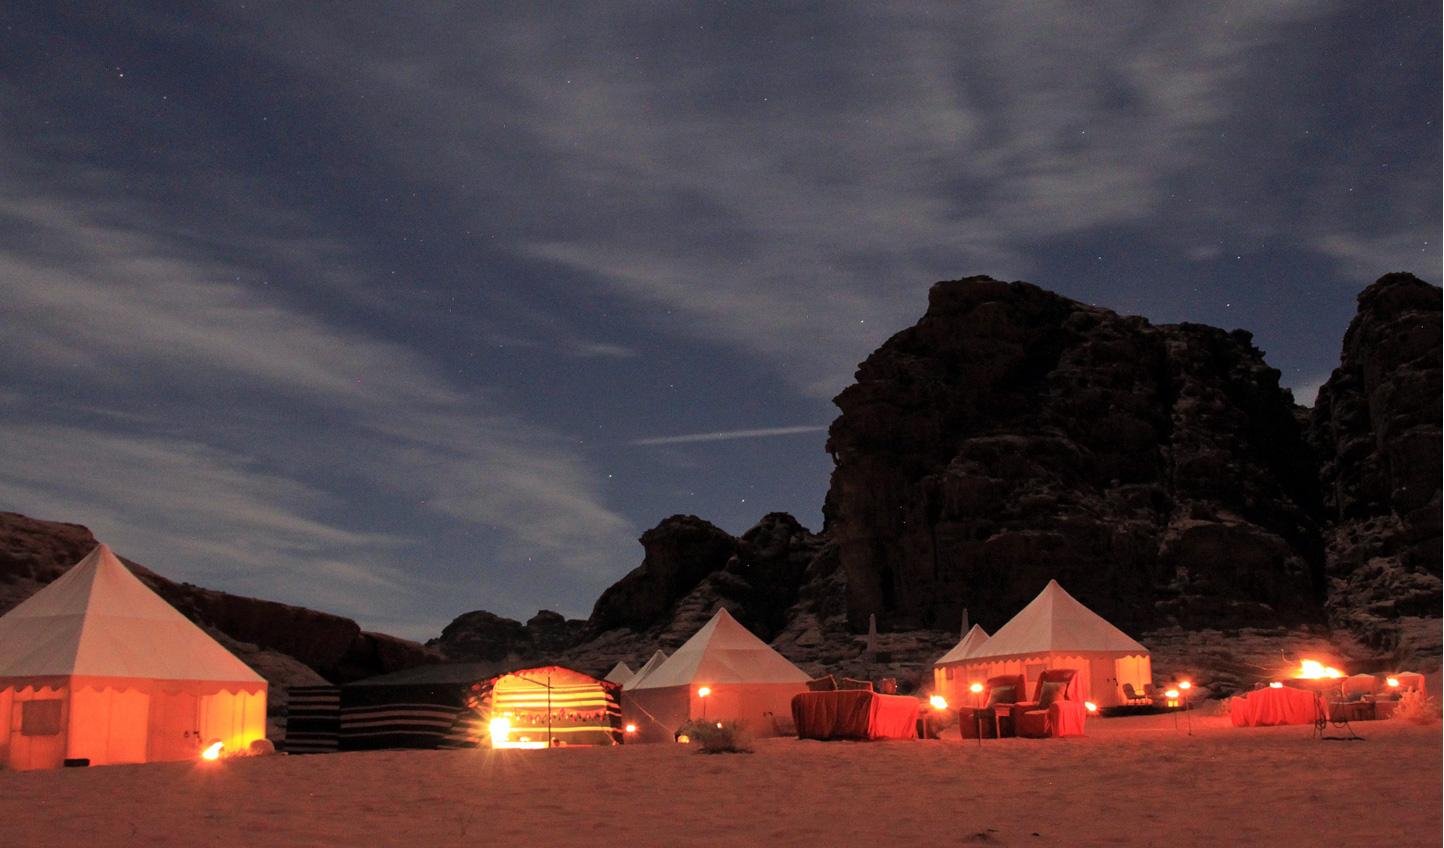 Slumber beneath the stars in the heart of Wadi Rum